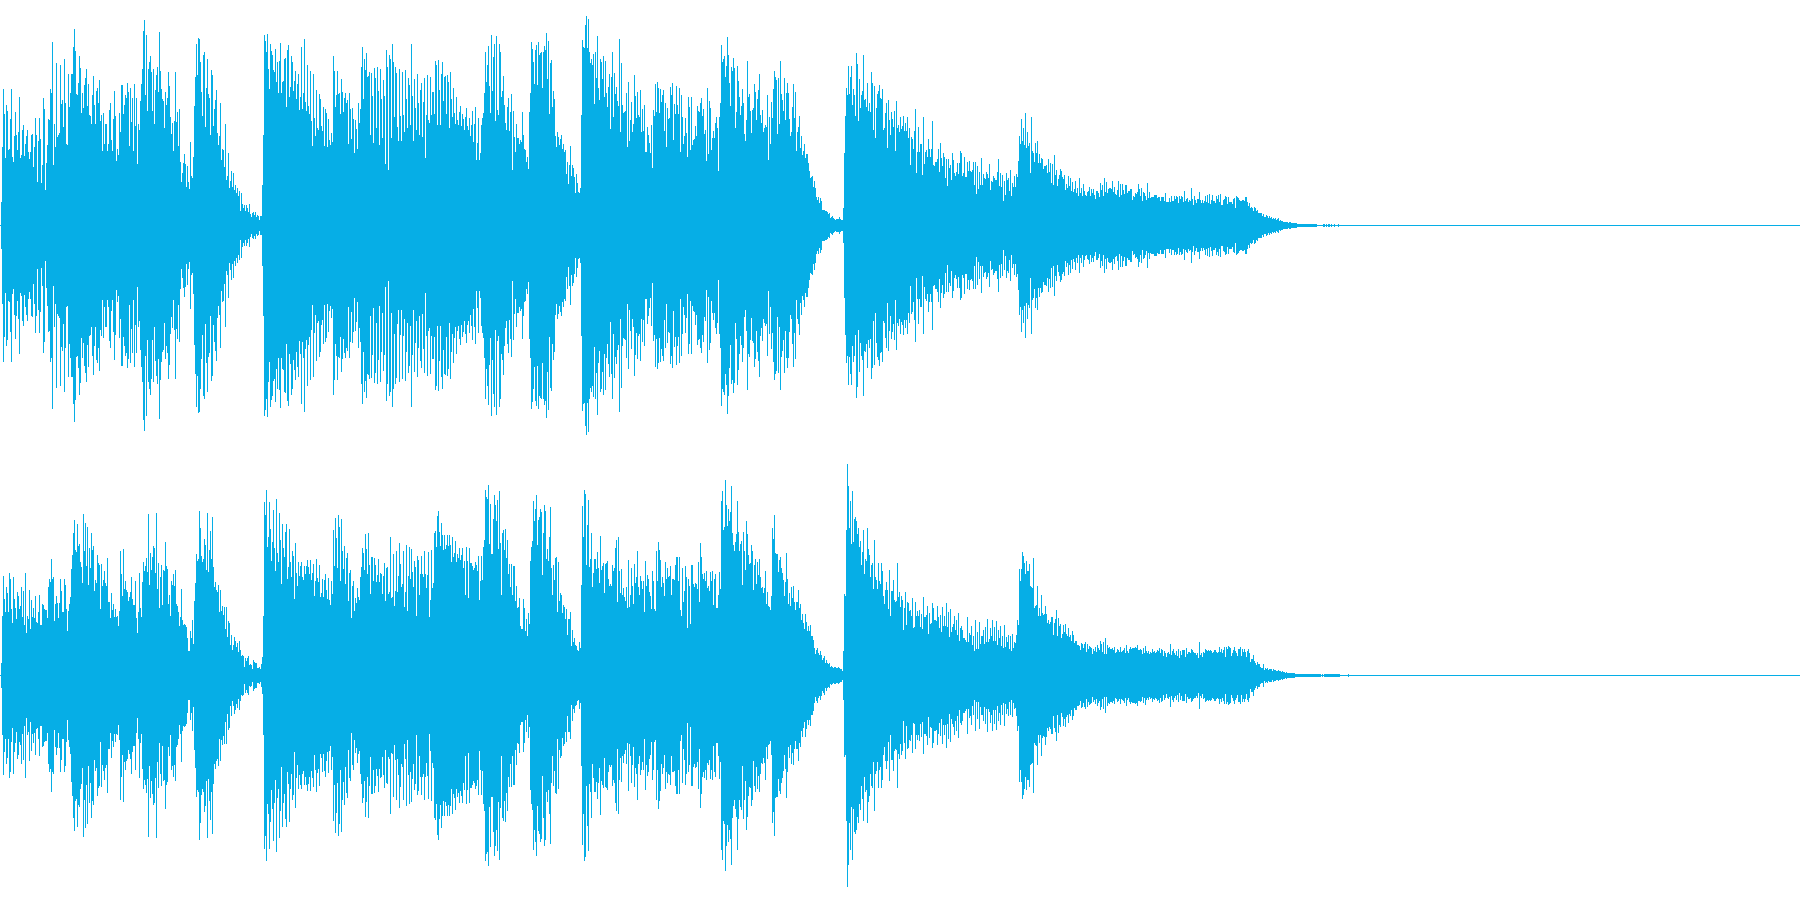 CM前などに ピアノジングル約8秒の再生済みの波形